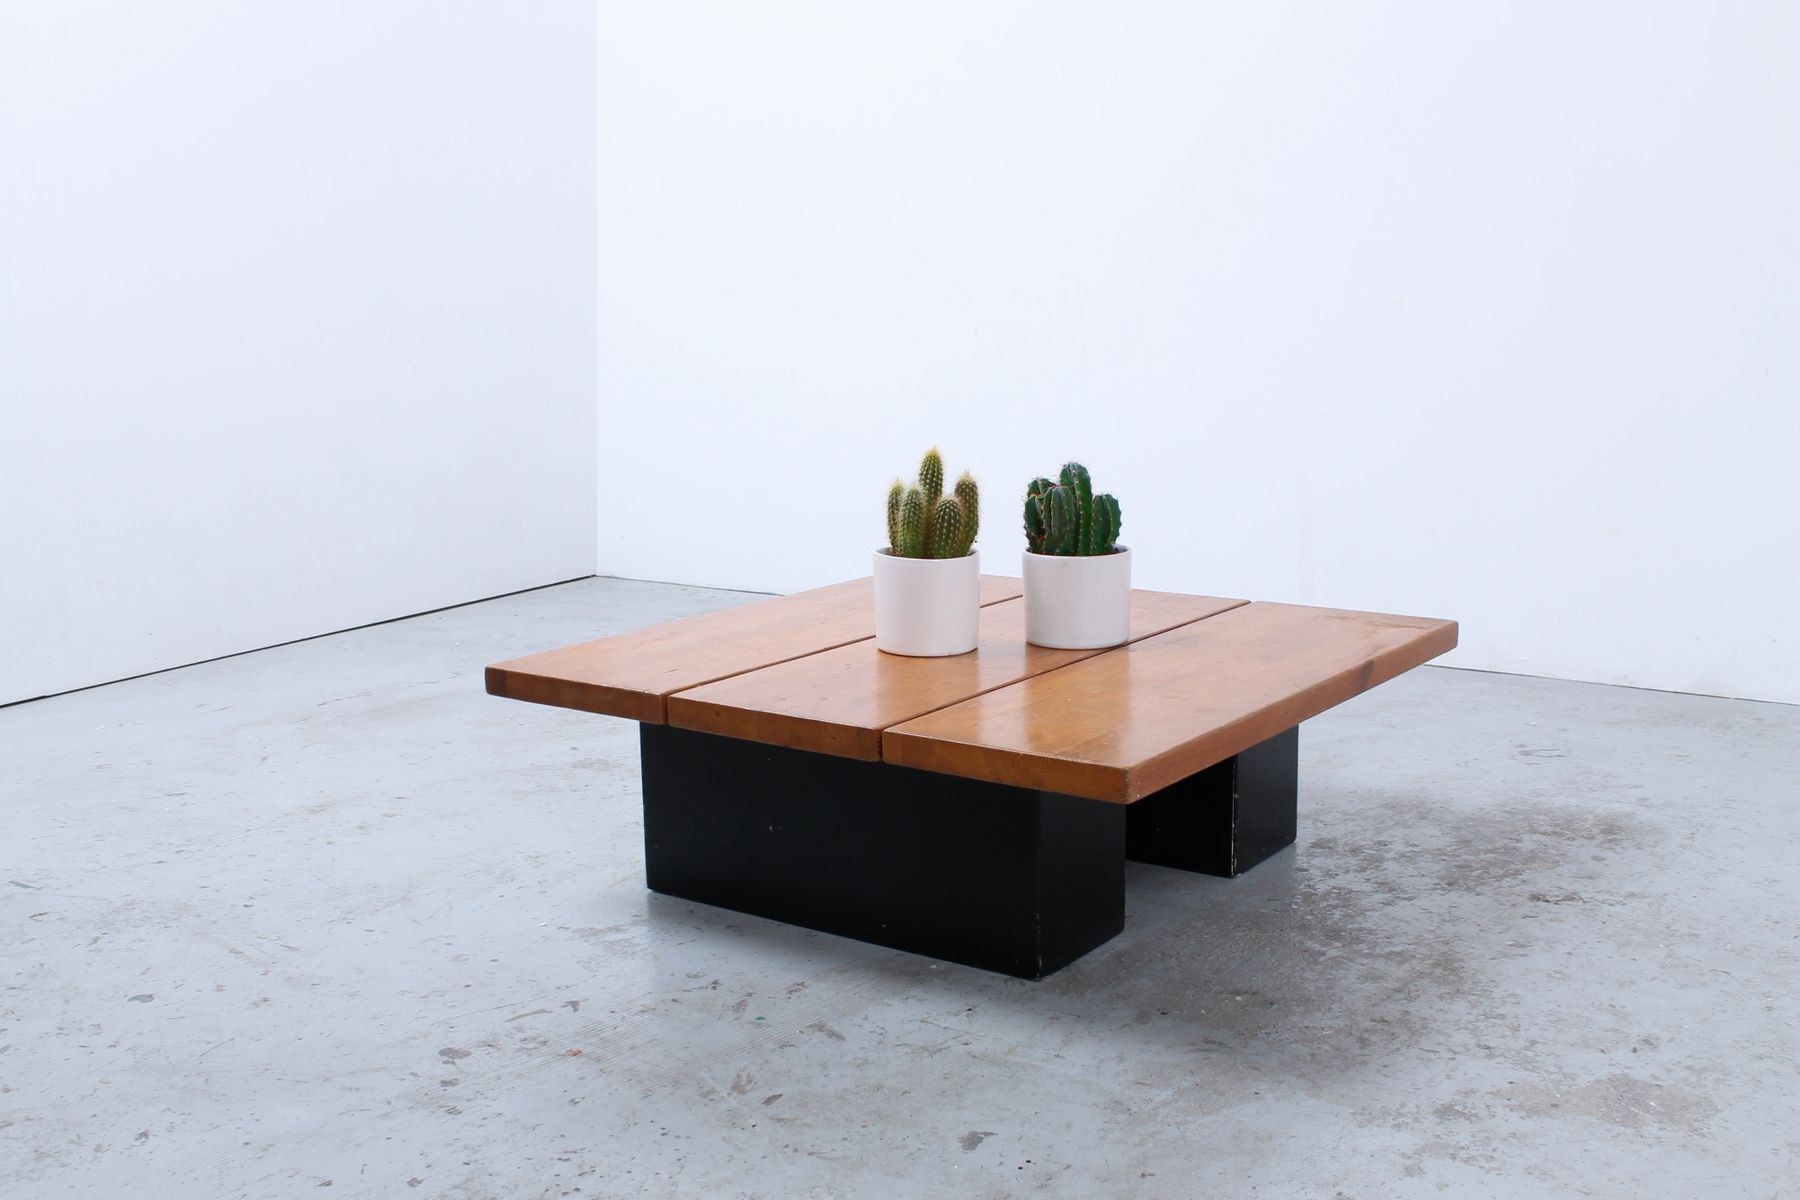 Finnish Low Coffee Table by Ilmari Tapiovaara for Laukaan Puu for